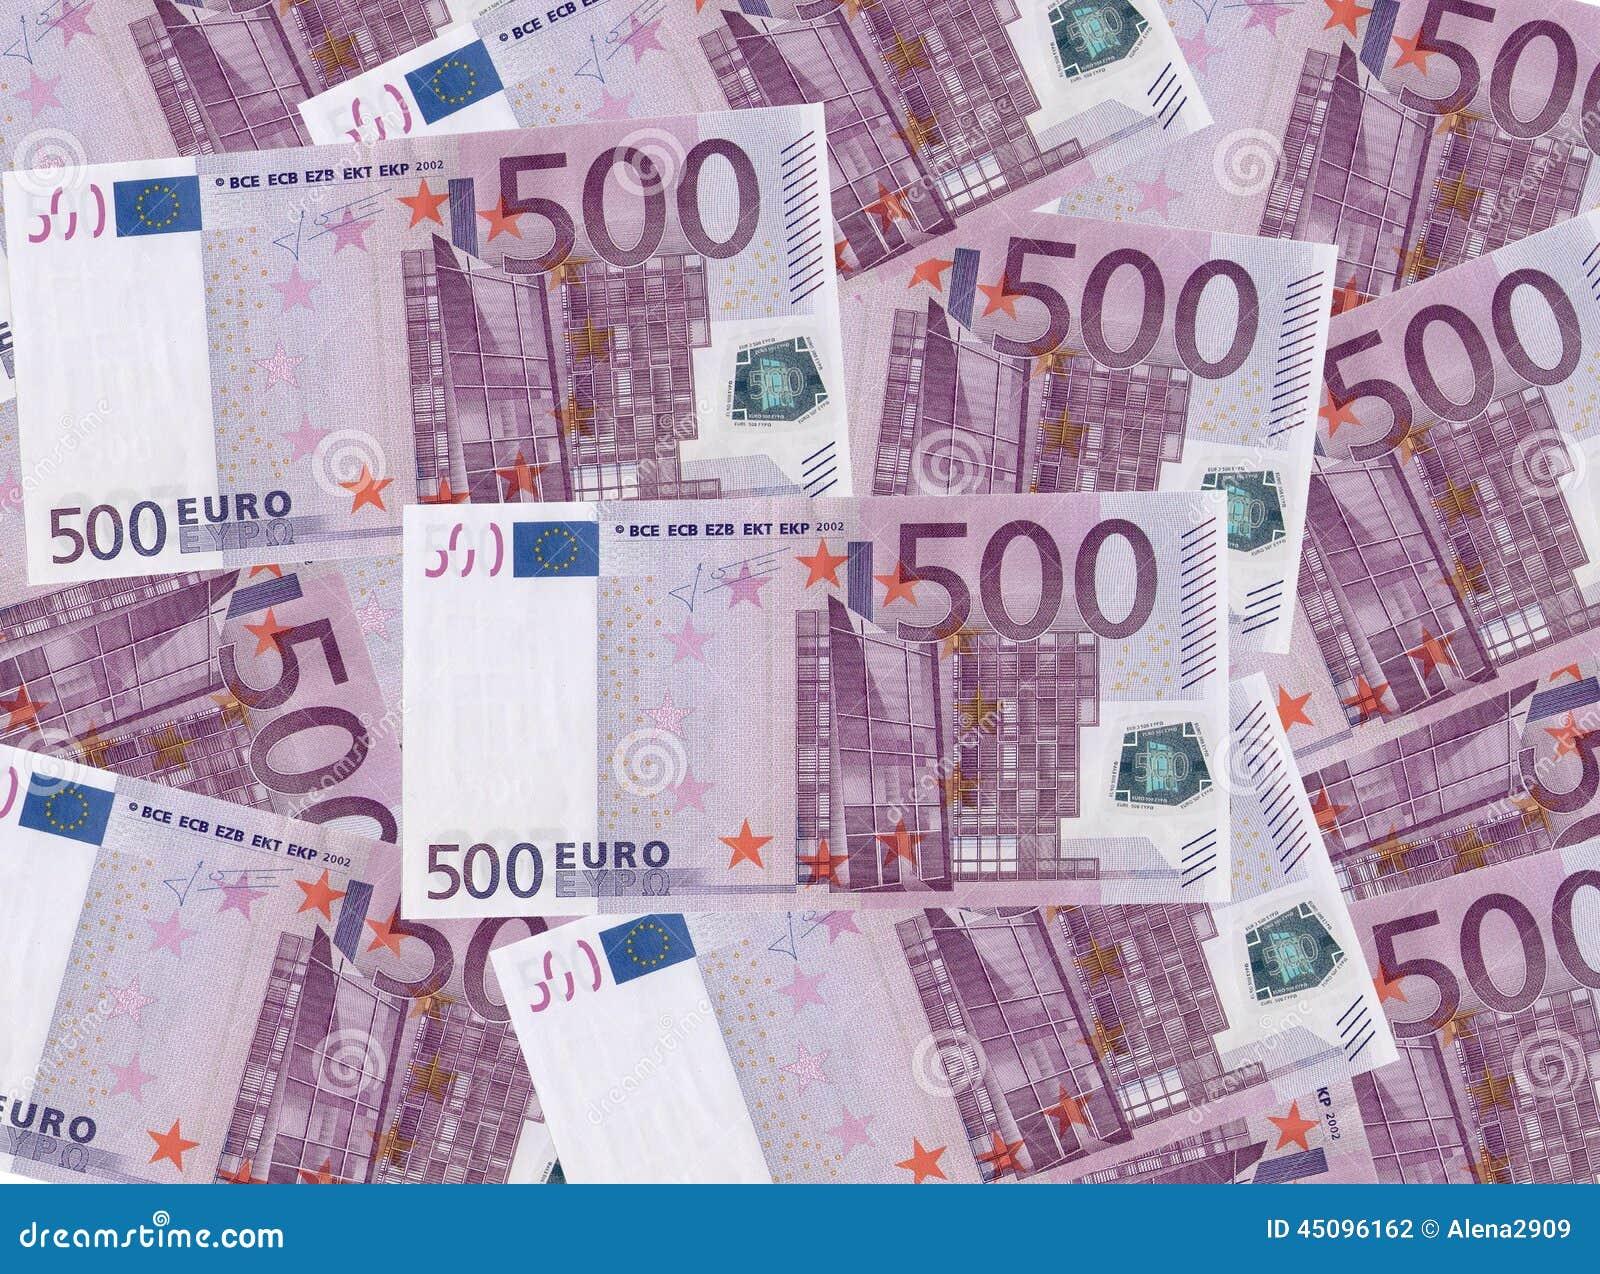 накрените веревочка примечания дег фокуса 100 евро 5 евро